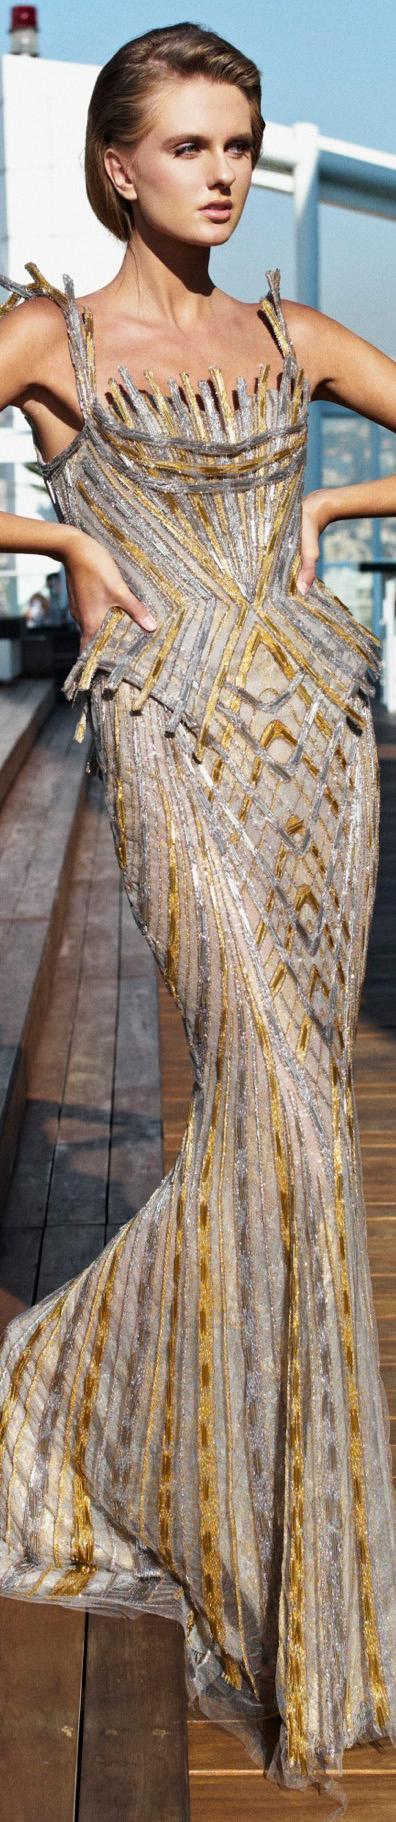 Ziad Nakad Haute Couture . Jaglady